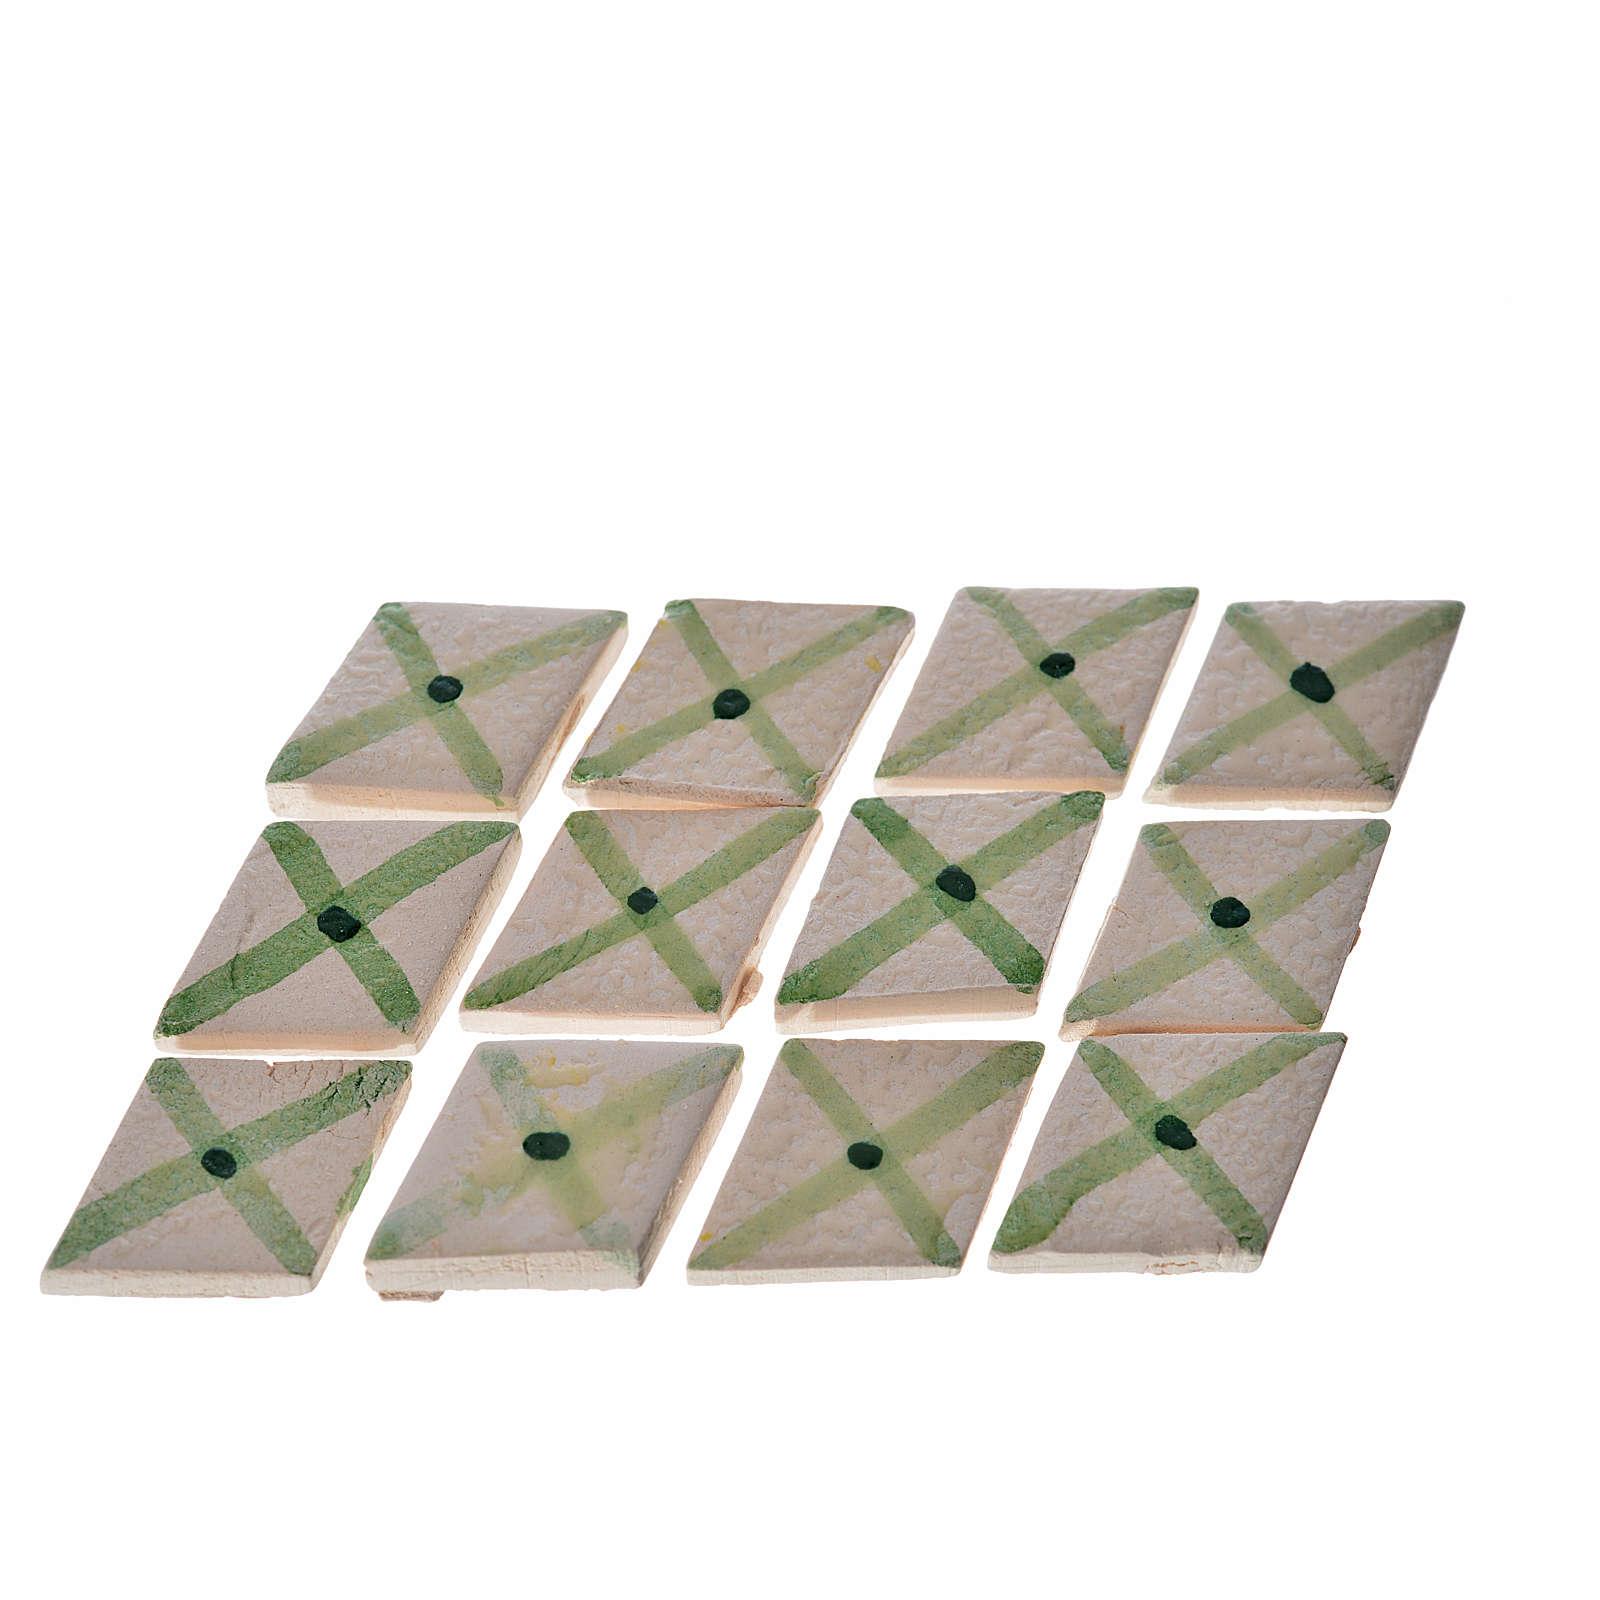 Azulejos de terracota esmaltada, 60pz triangulares linea verde 4